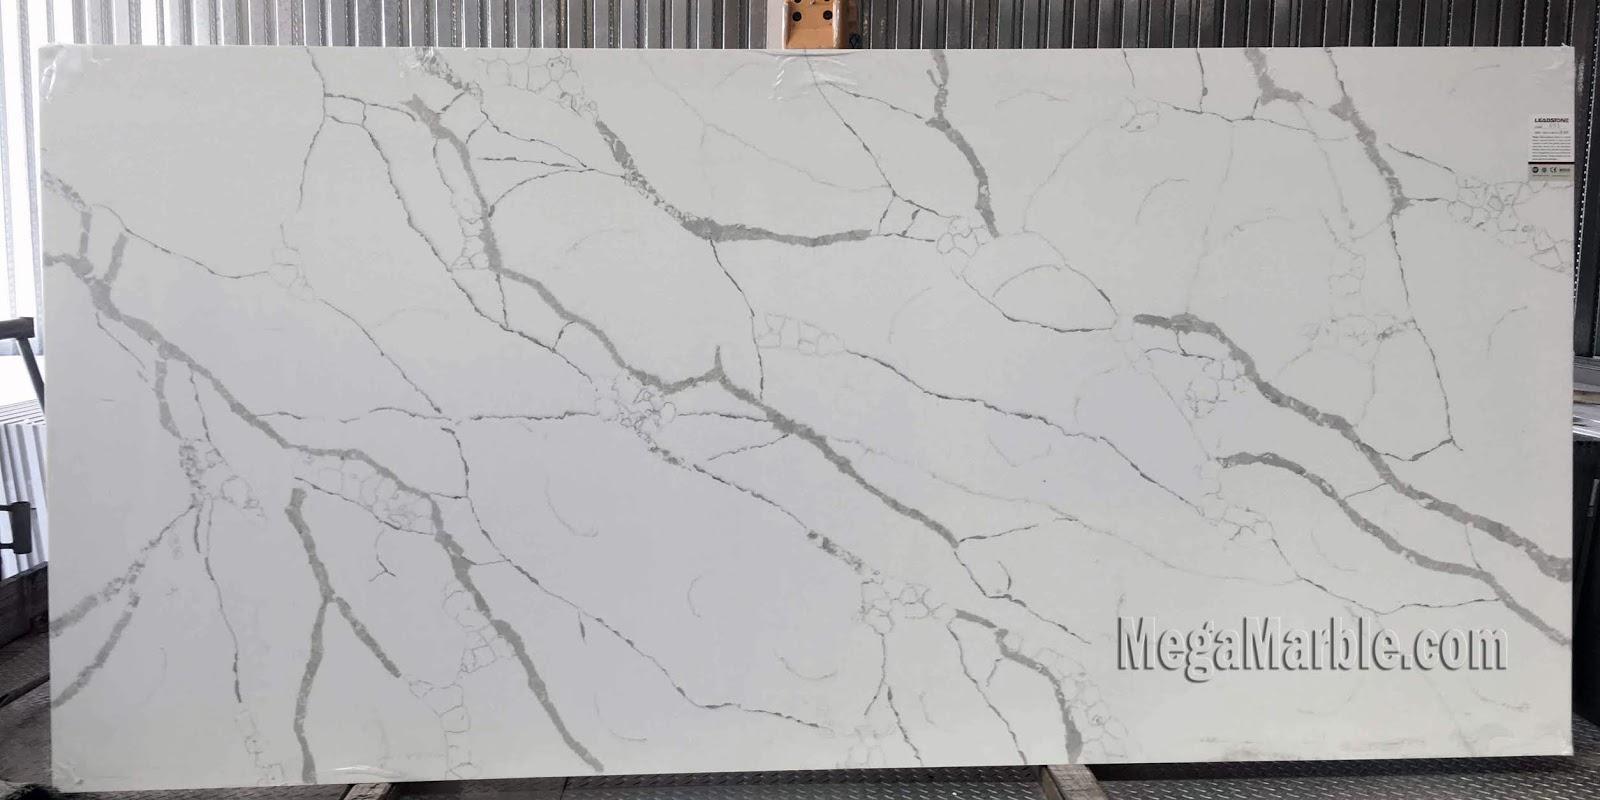 Quartz Countertops That Look Like Marble Countertops New York